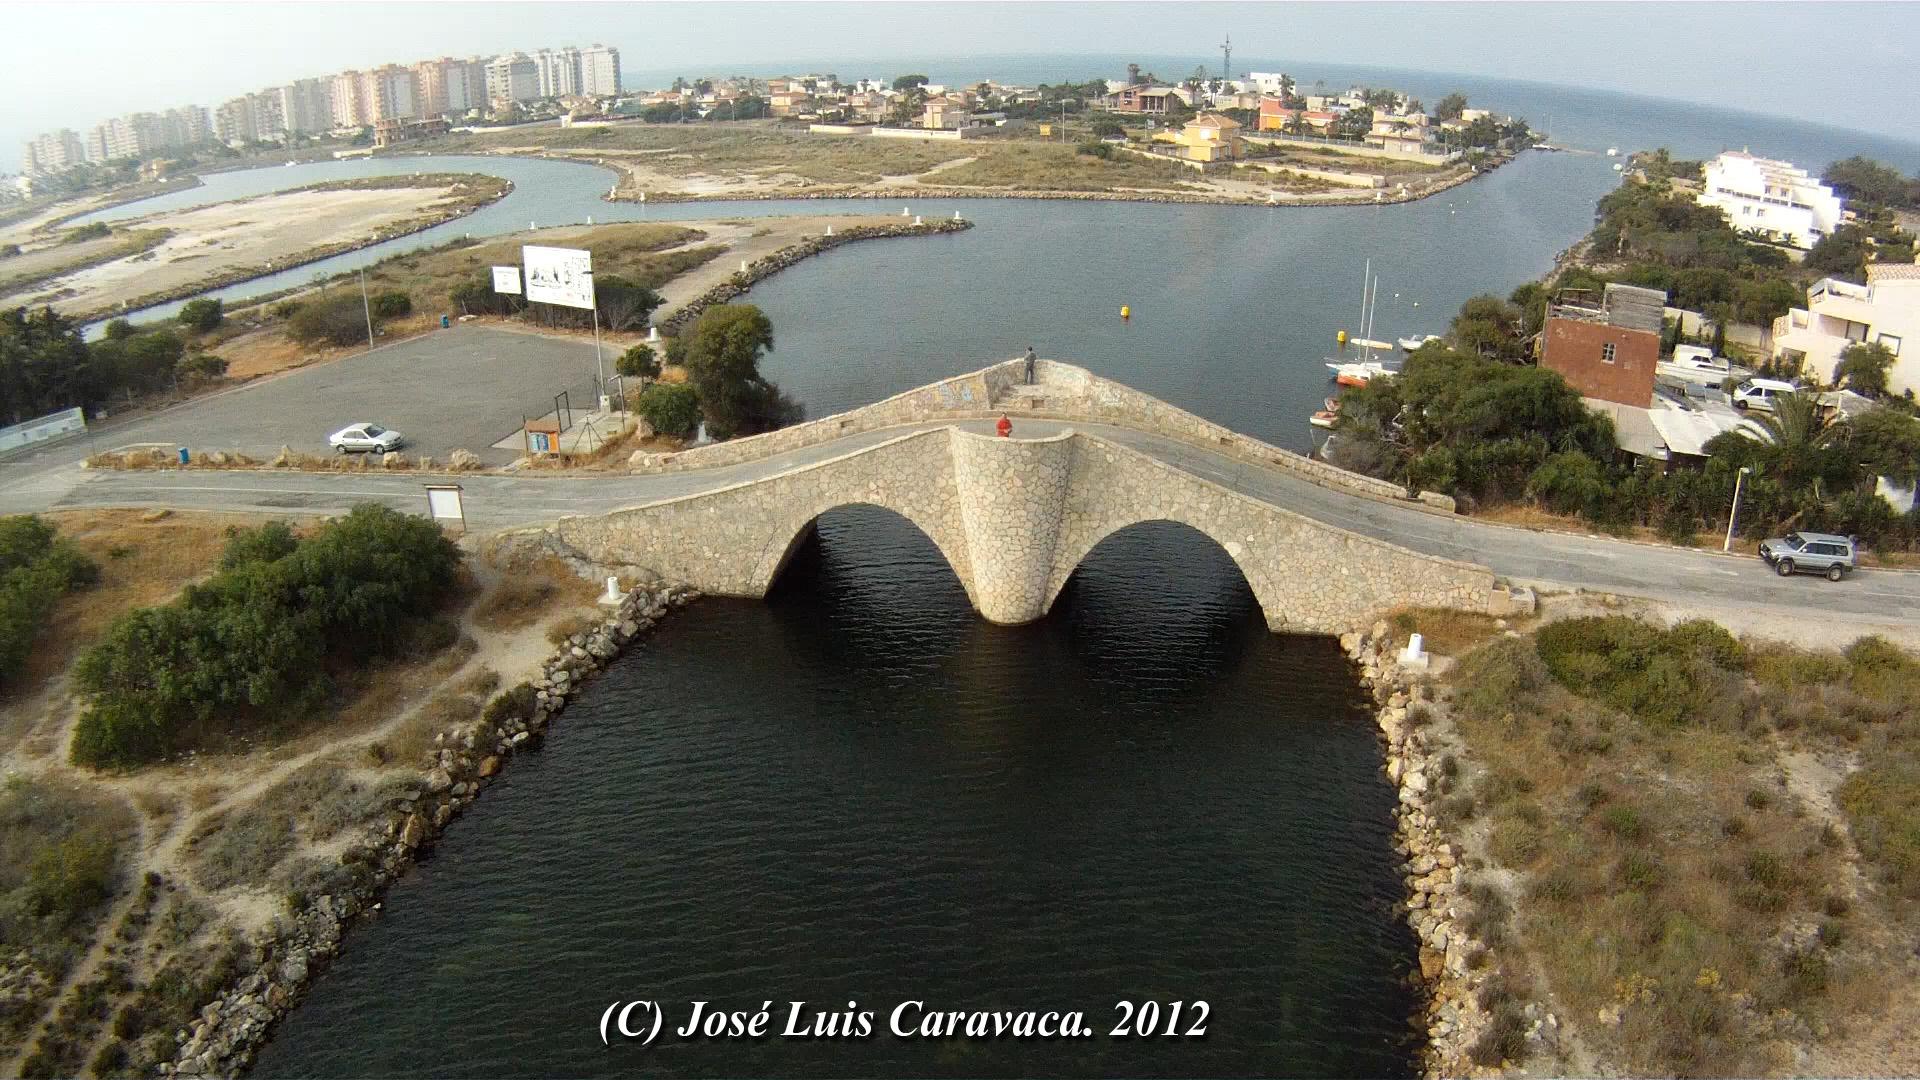 Puente de la Risa. La Manga del Mar Menor. San Javier. Murcia. Spain